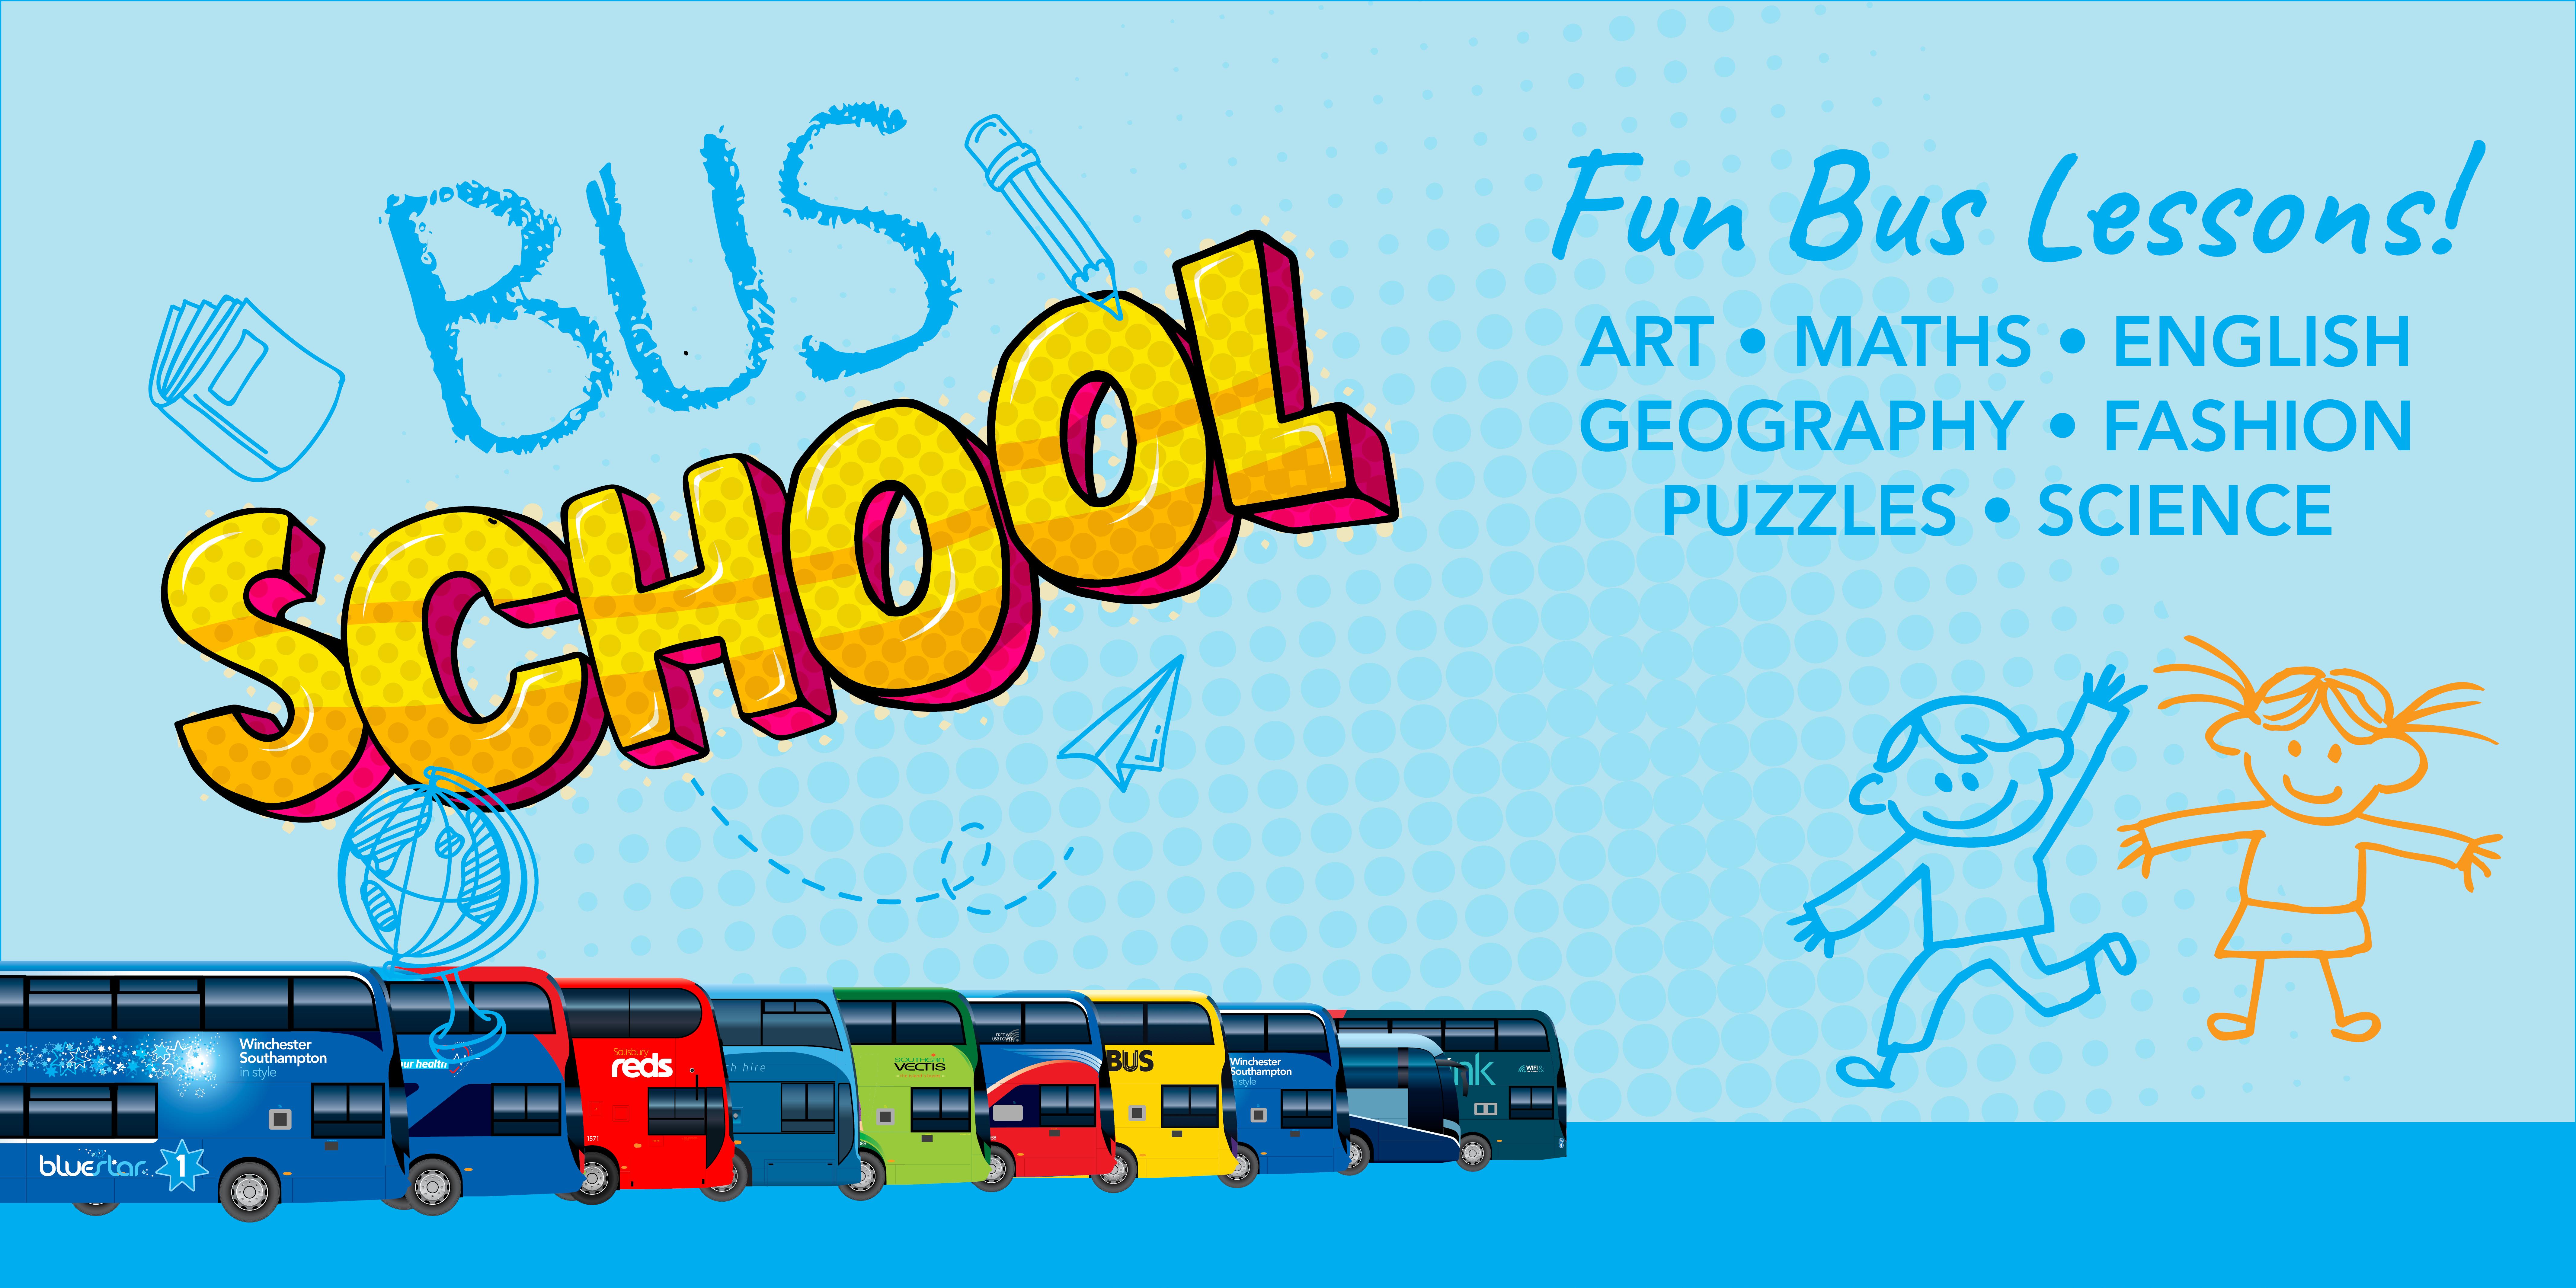 Image reading 'Bus School - fun bus lessons!'